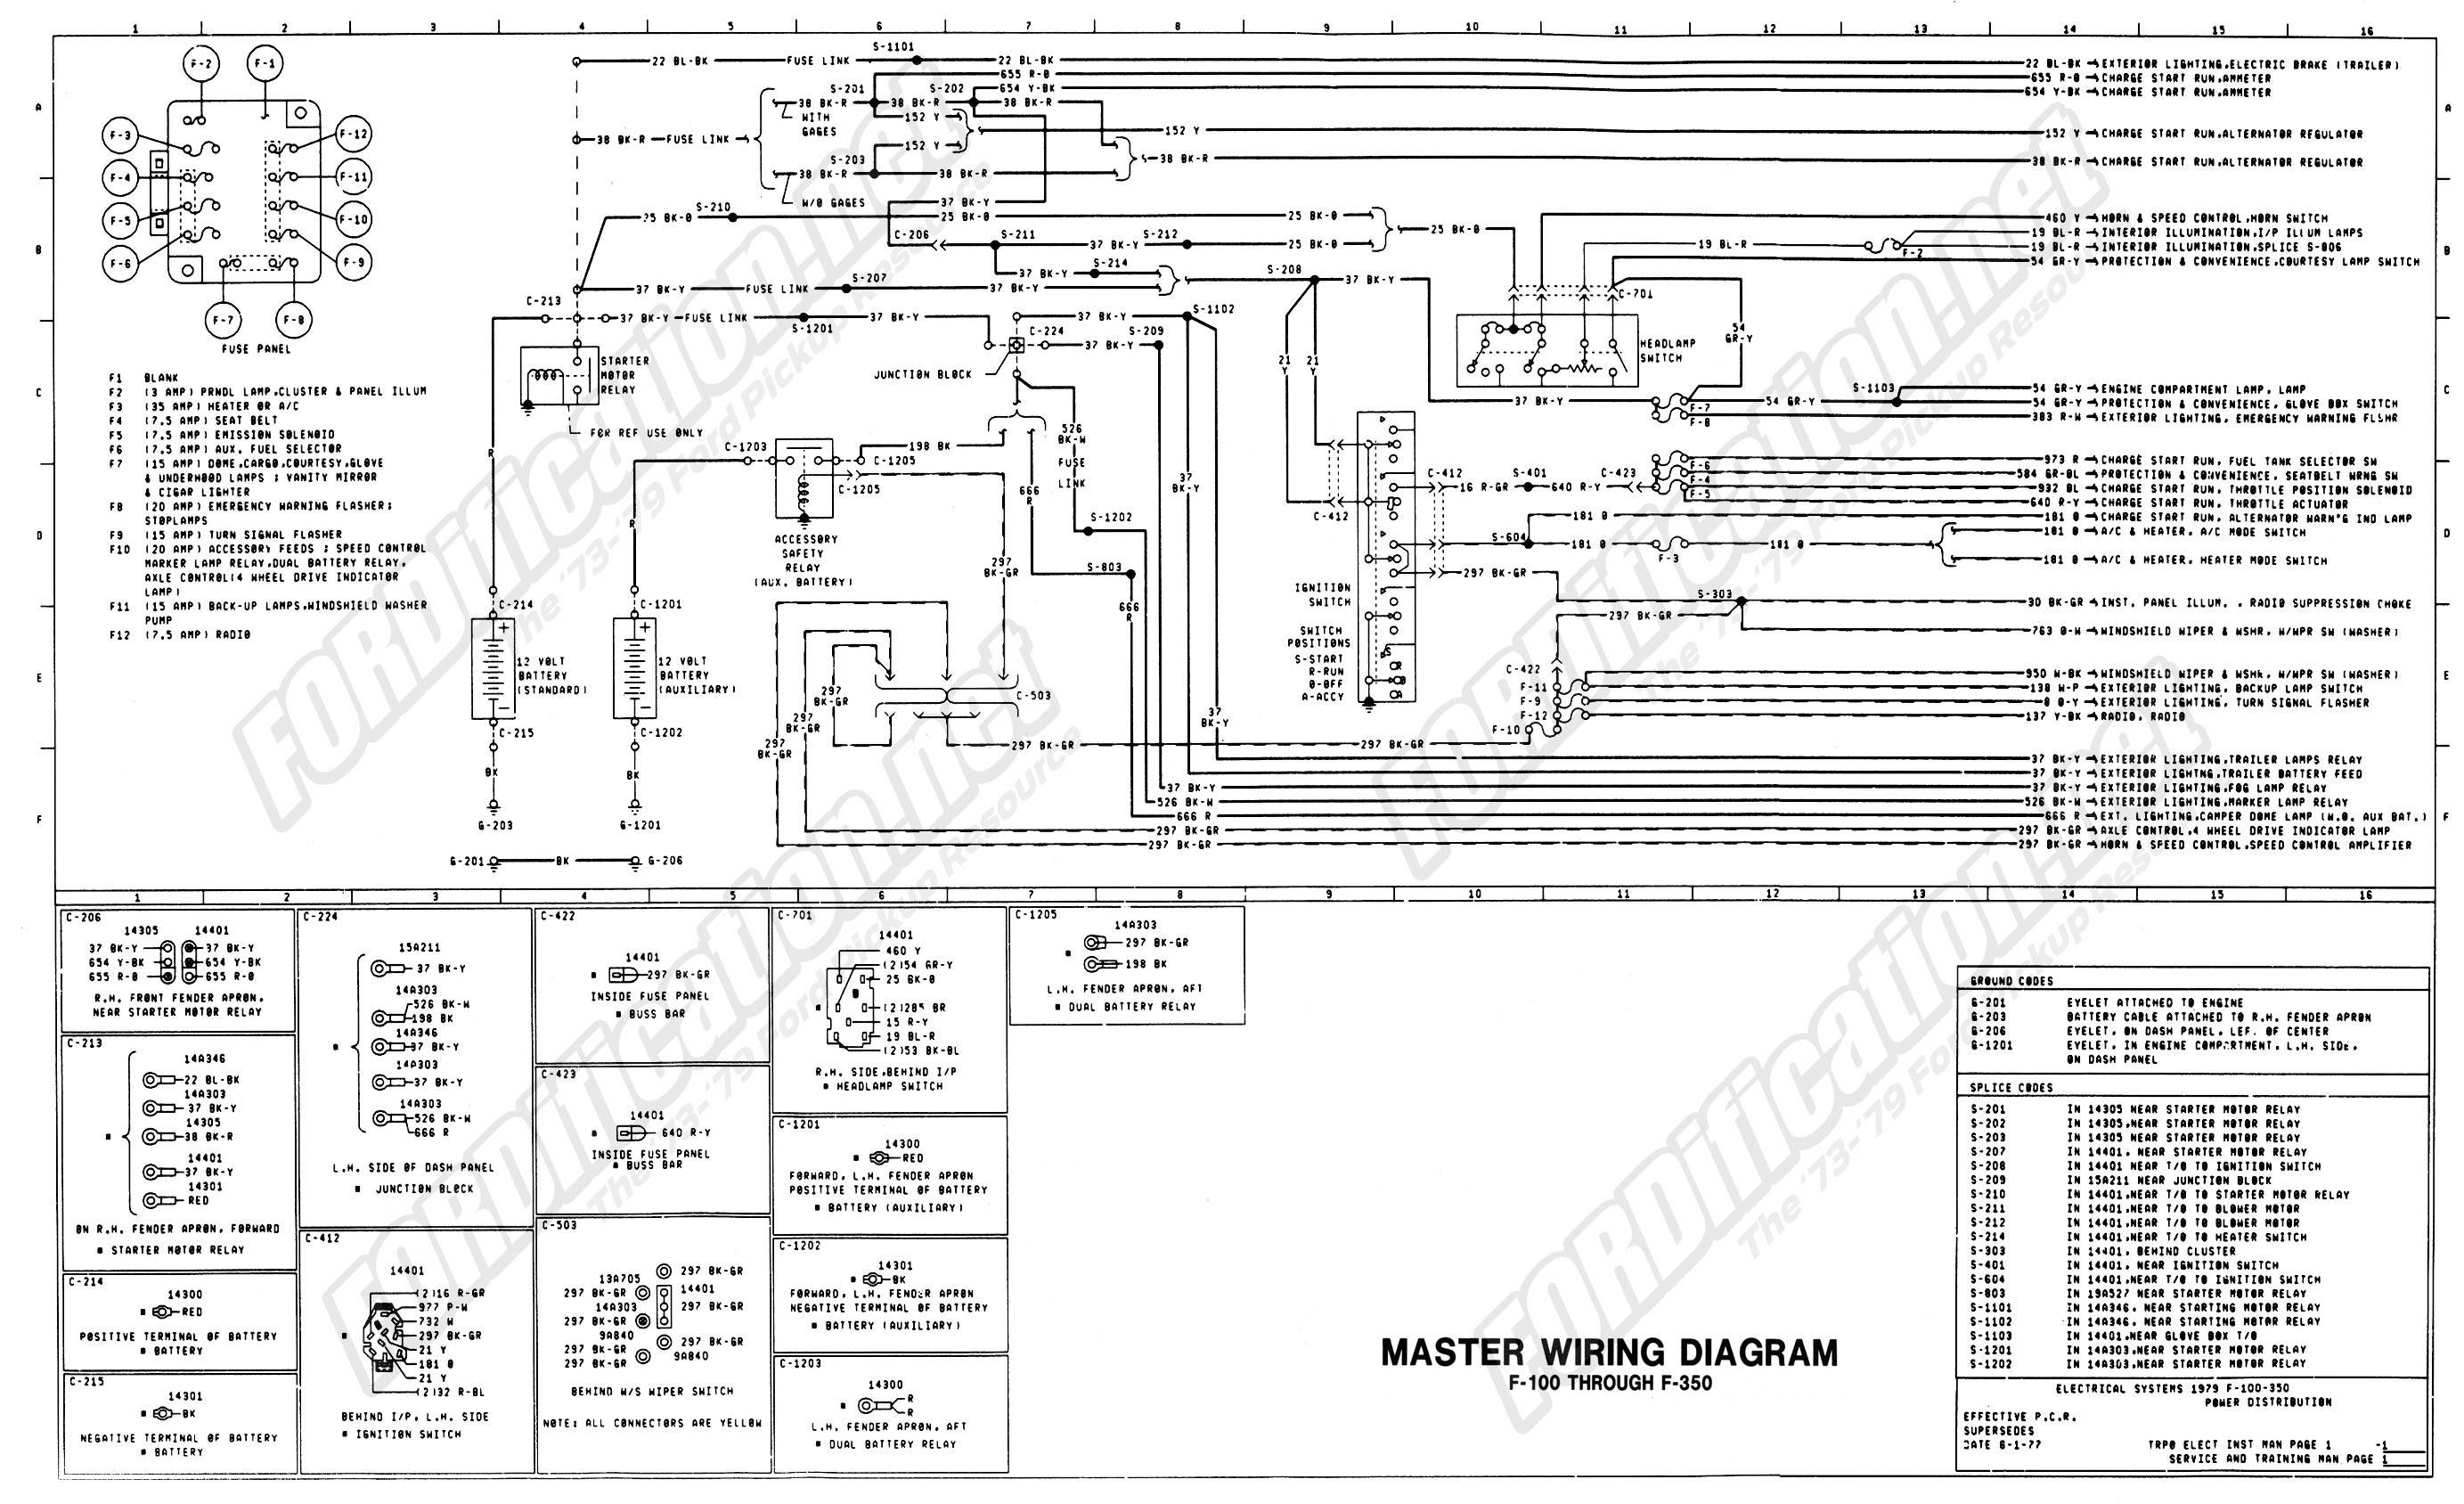 1999 ford 550 Tailight Diagram ford E 350 Fuse Box Location Of 1999 ford 550 Tailight Diagram